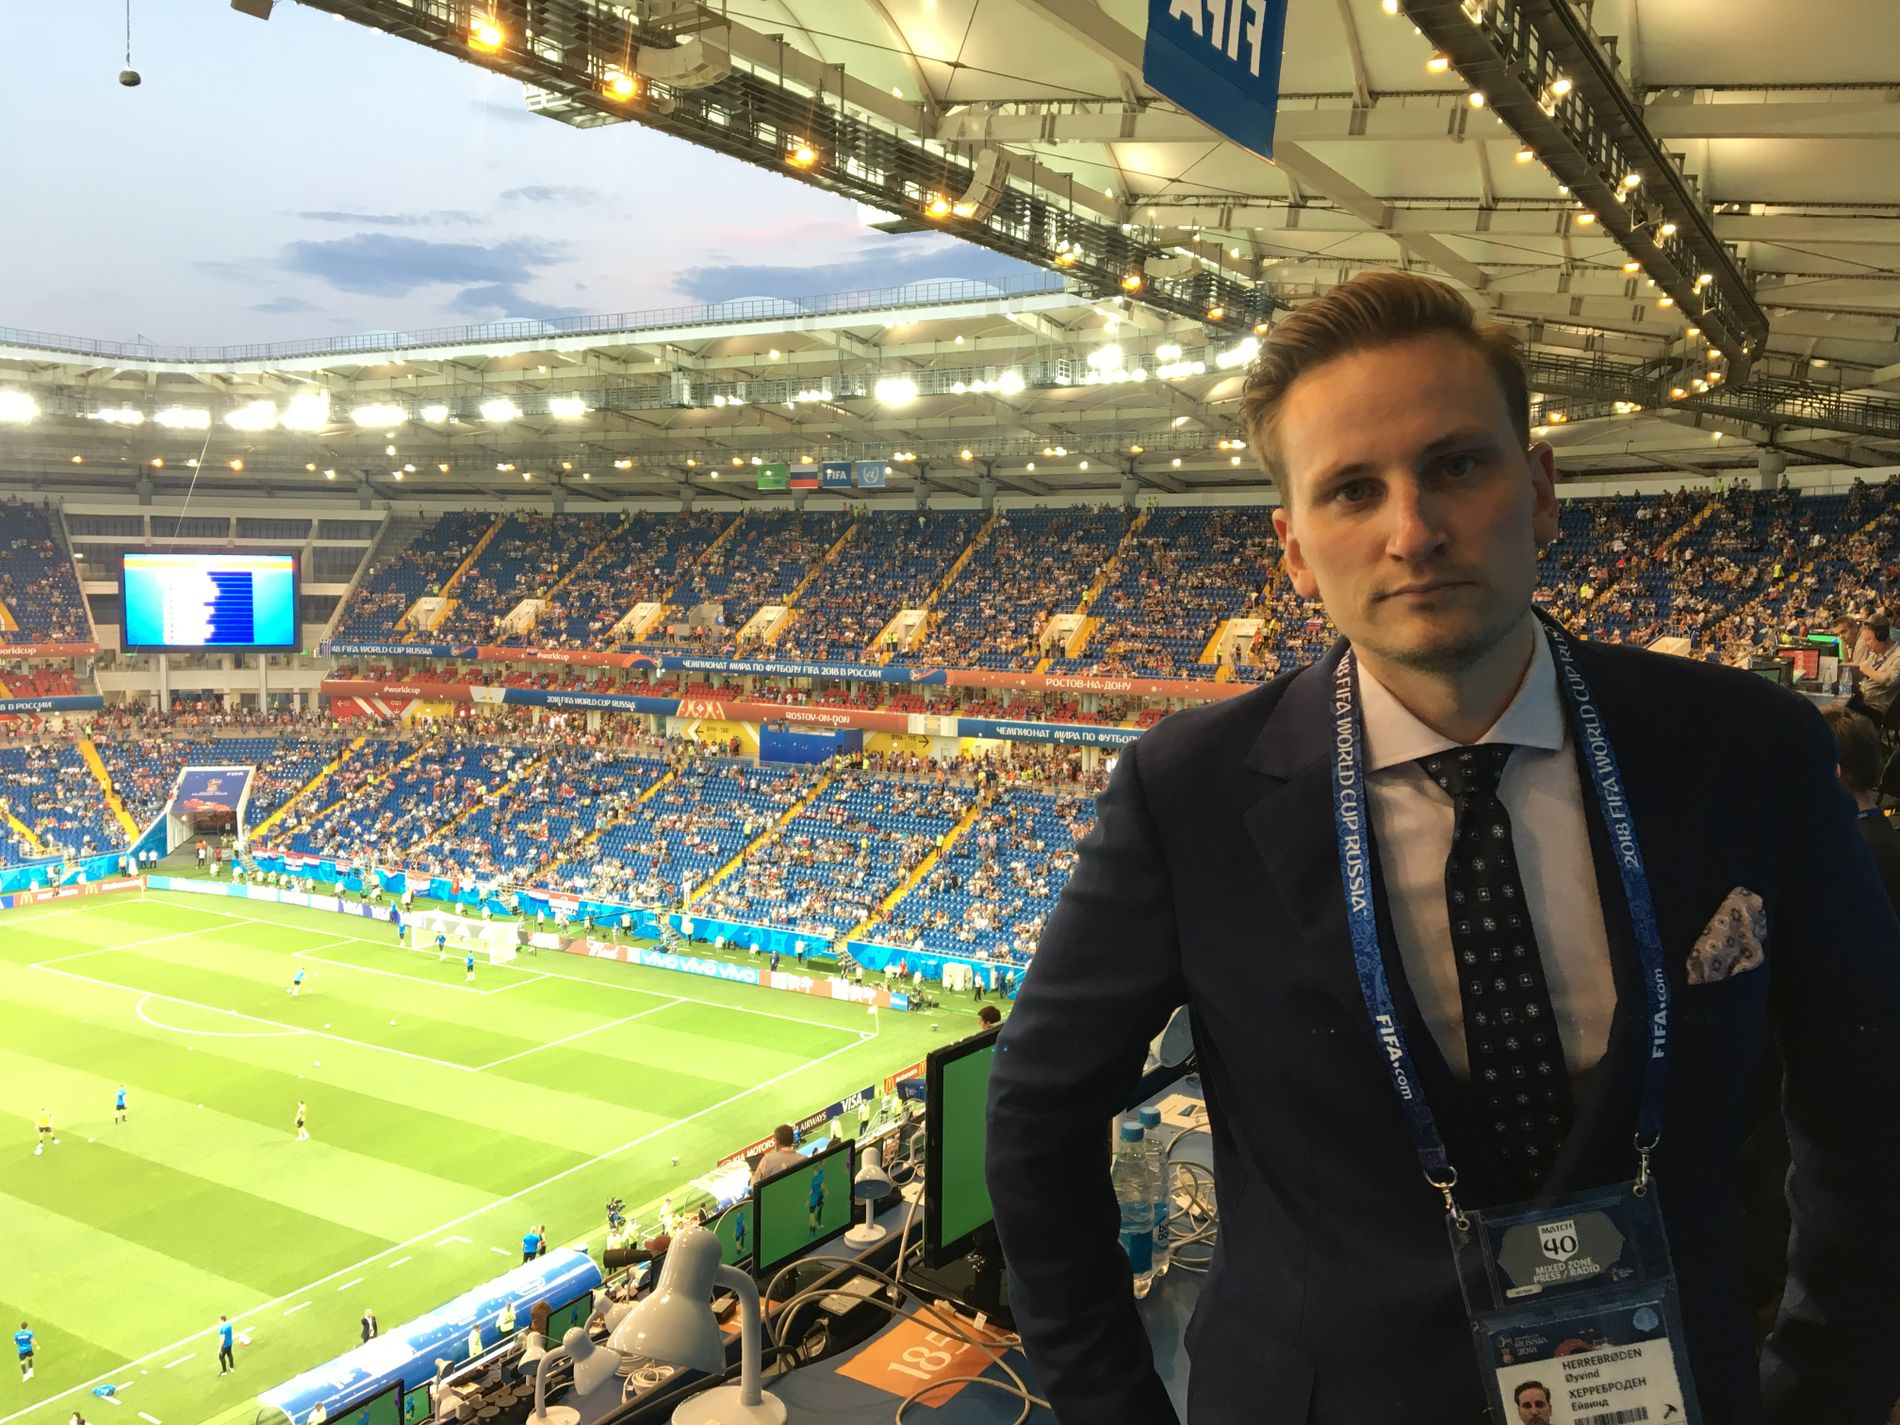 I ROSTOV: VG-journalist Øyvind Herrebrøden følger fotball-VM i Russland.